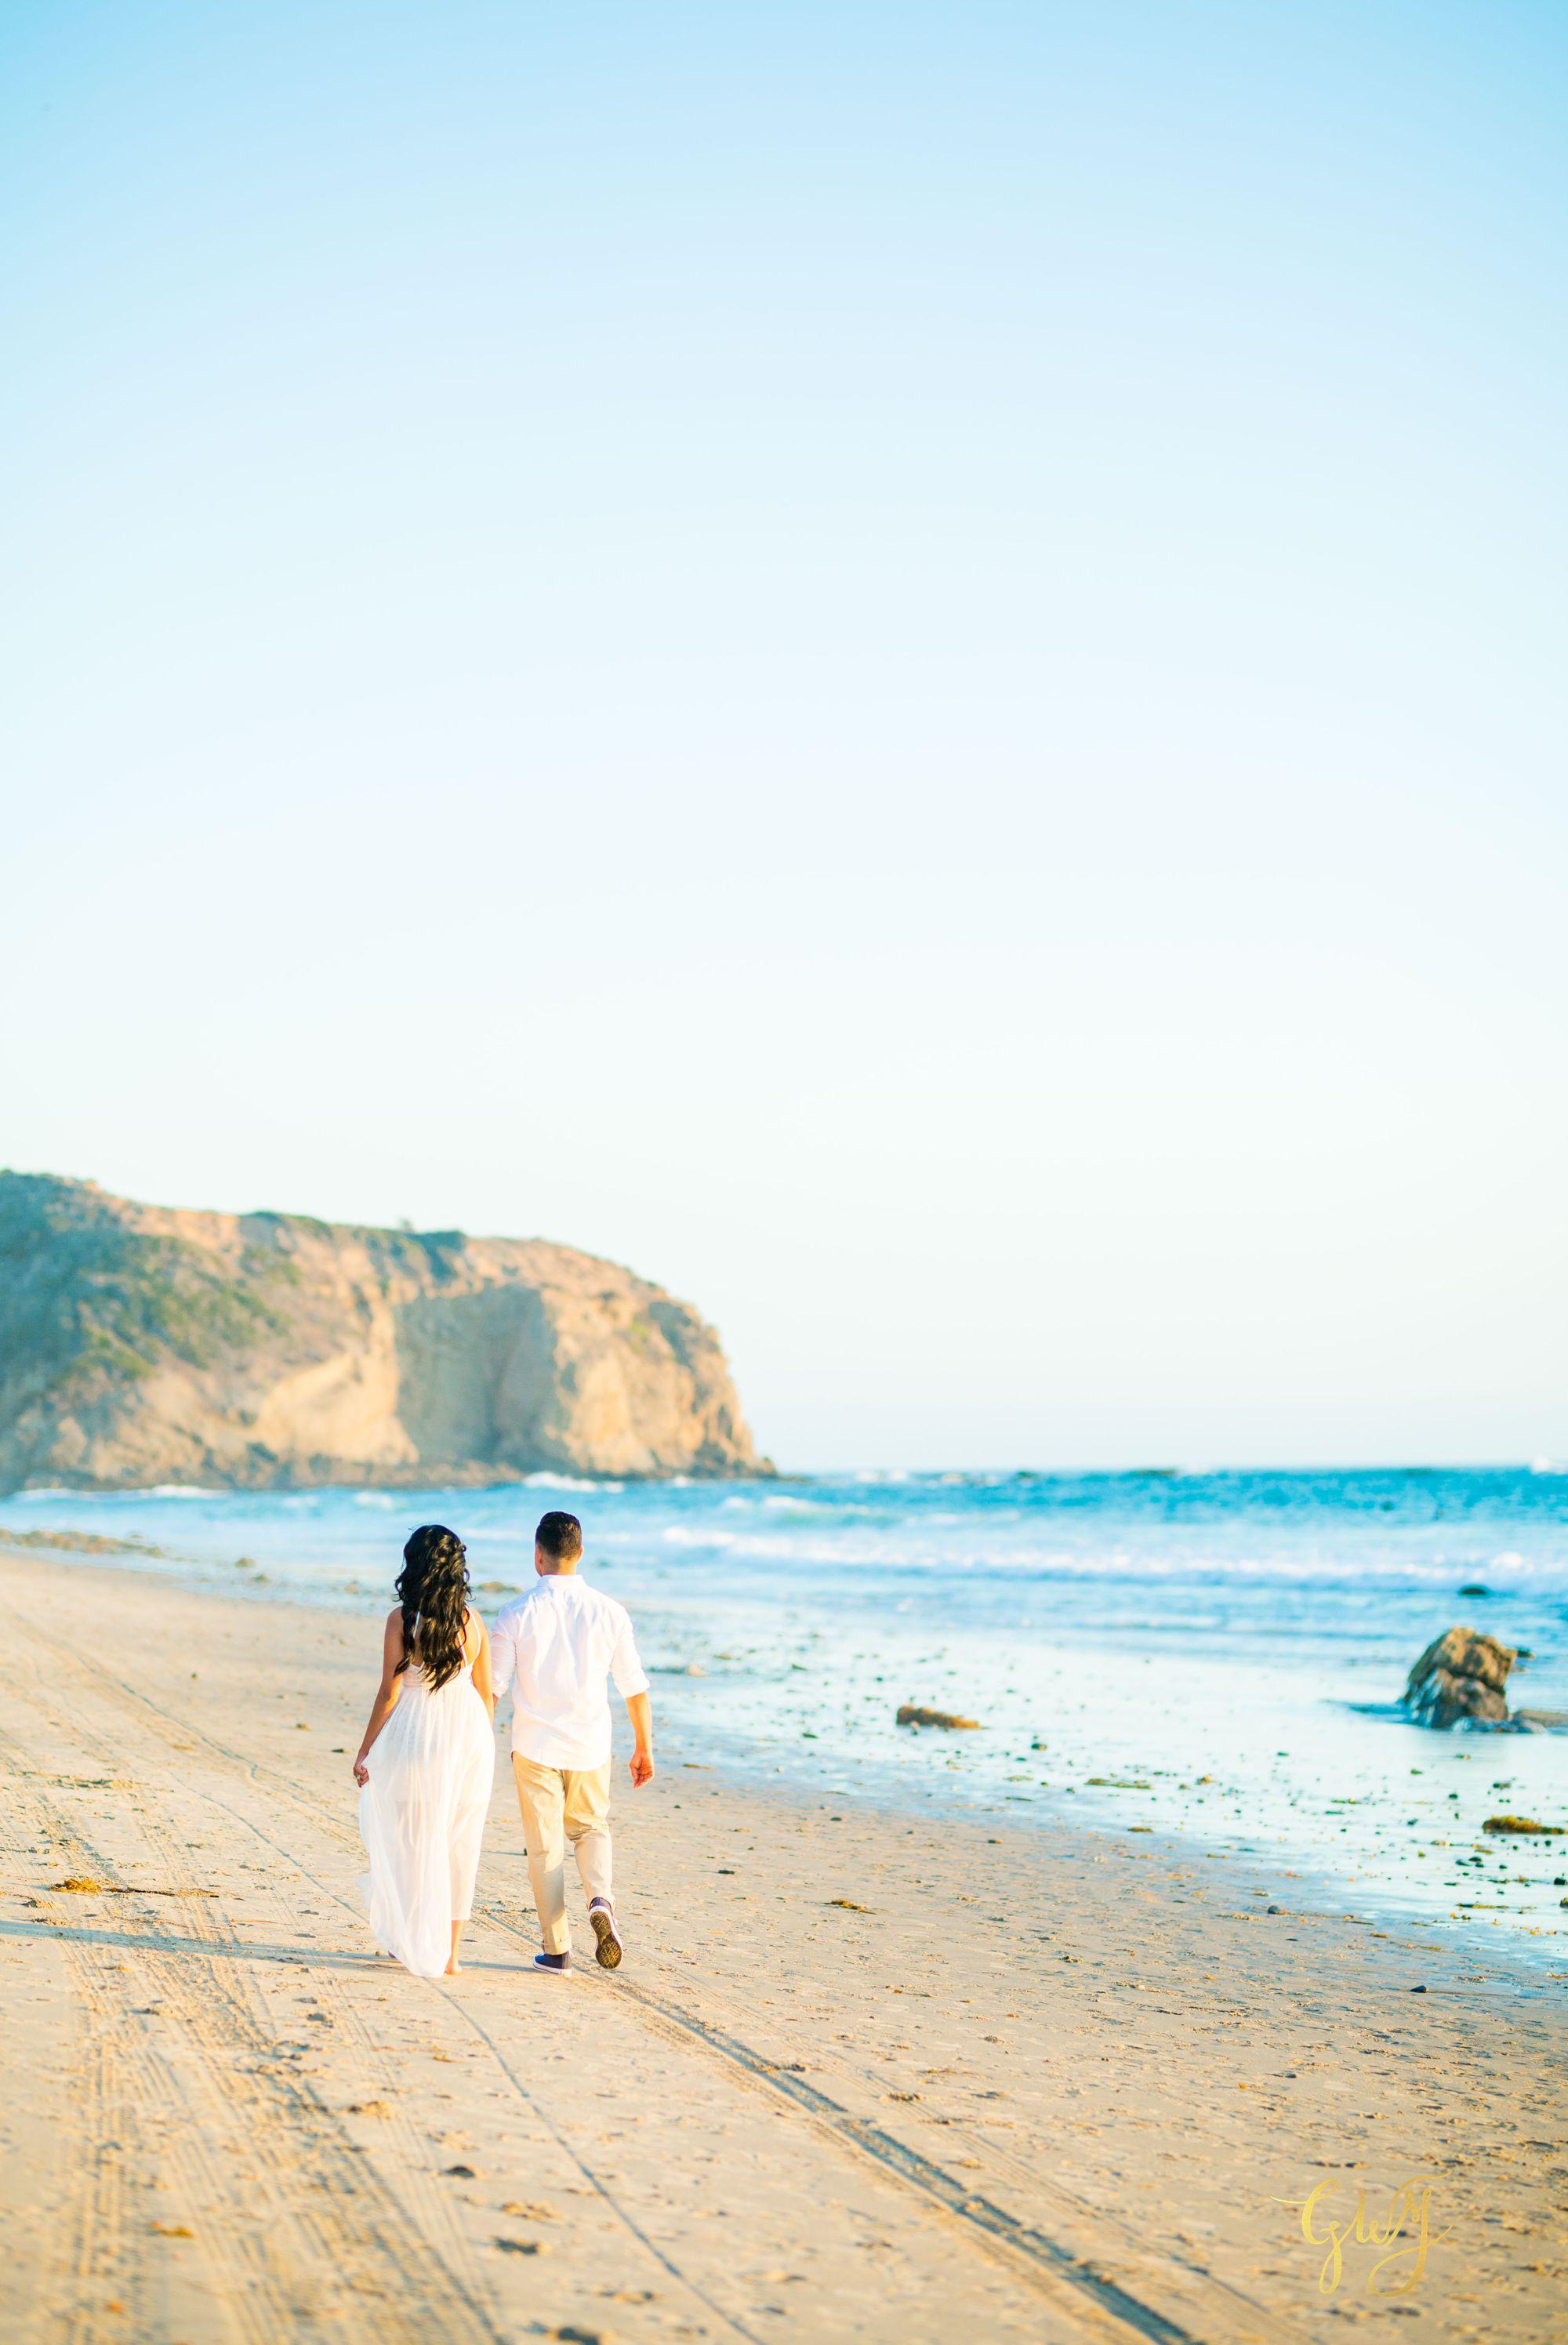 Angela + Drew Mission San Juan Capistrano Strands Beach Sunset Engagement 10.jpg